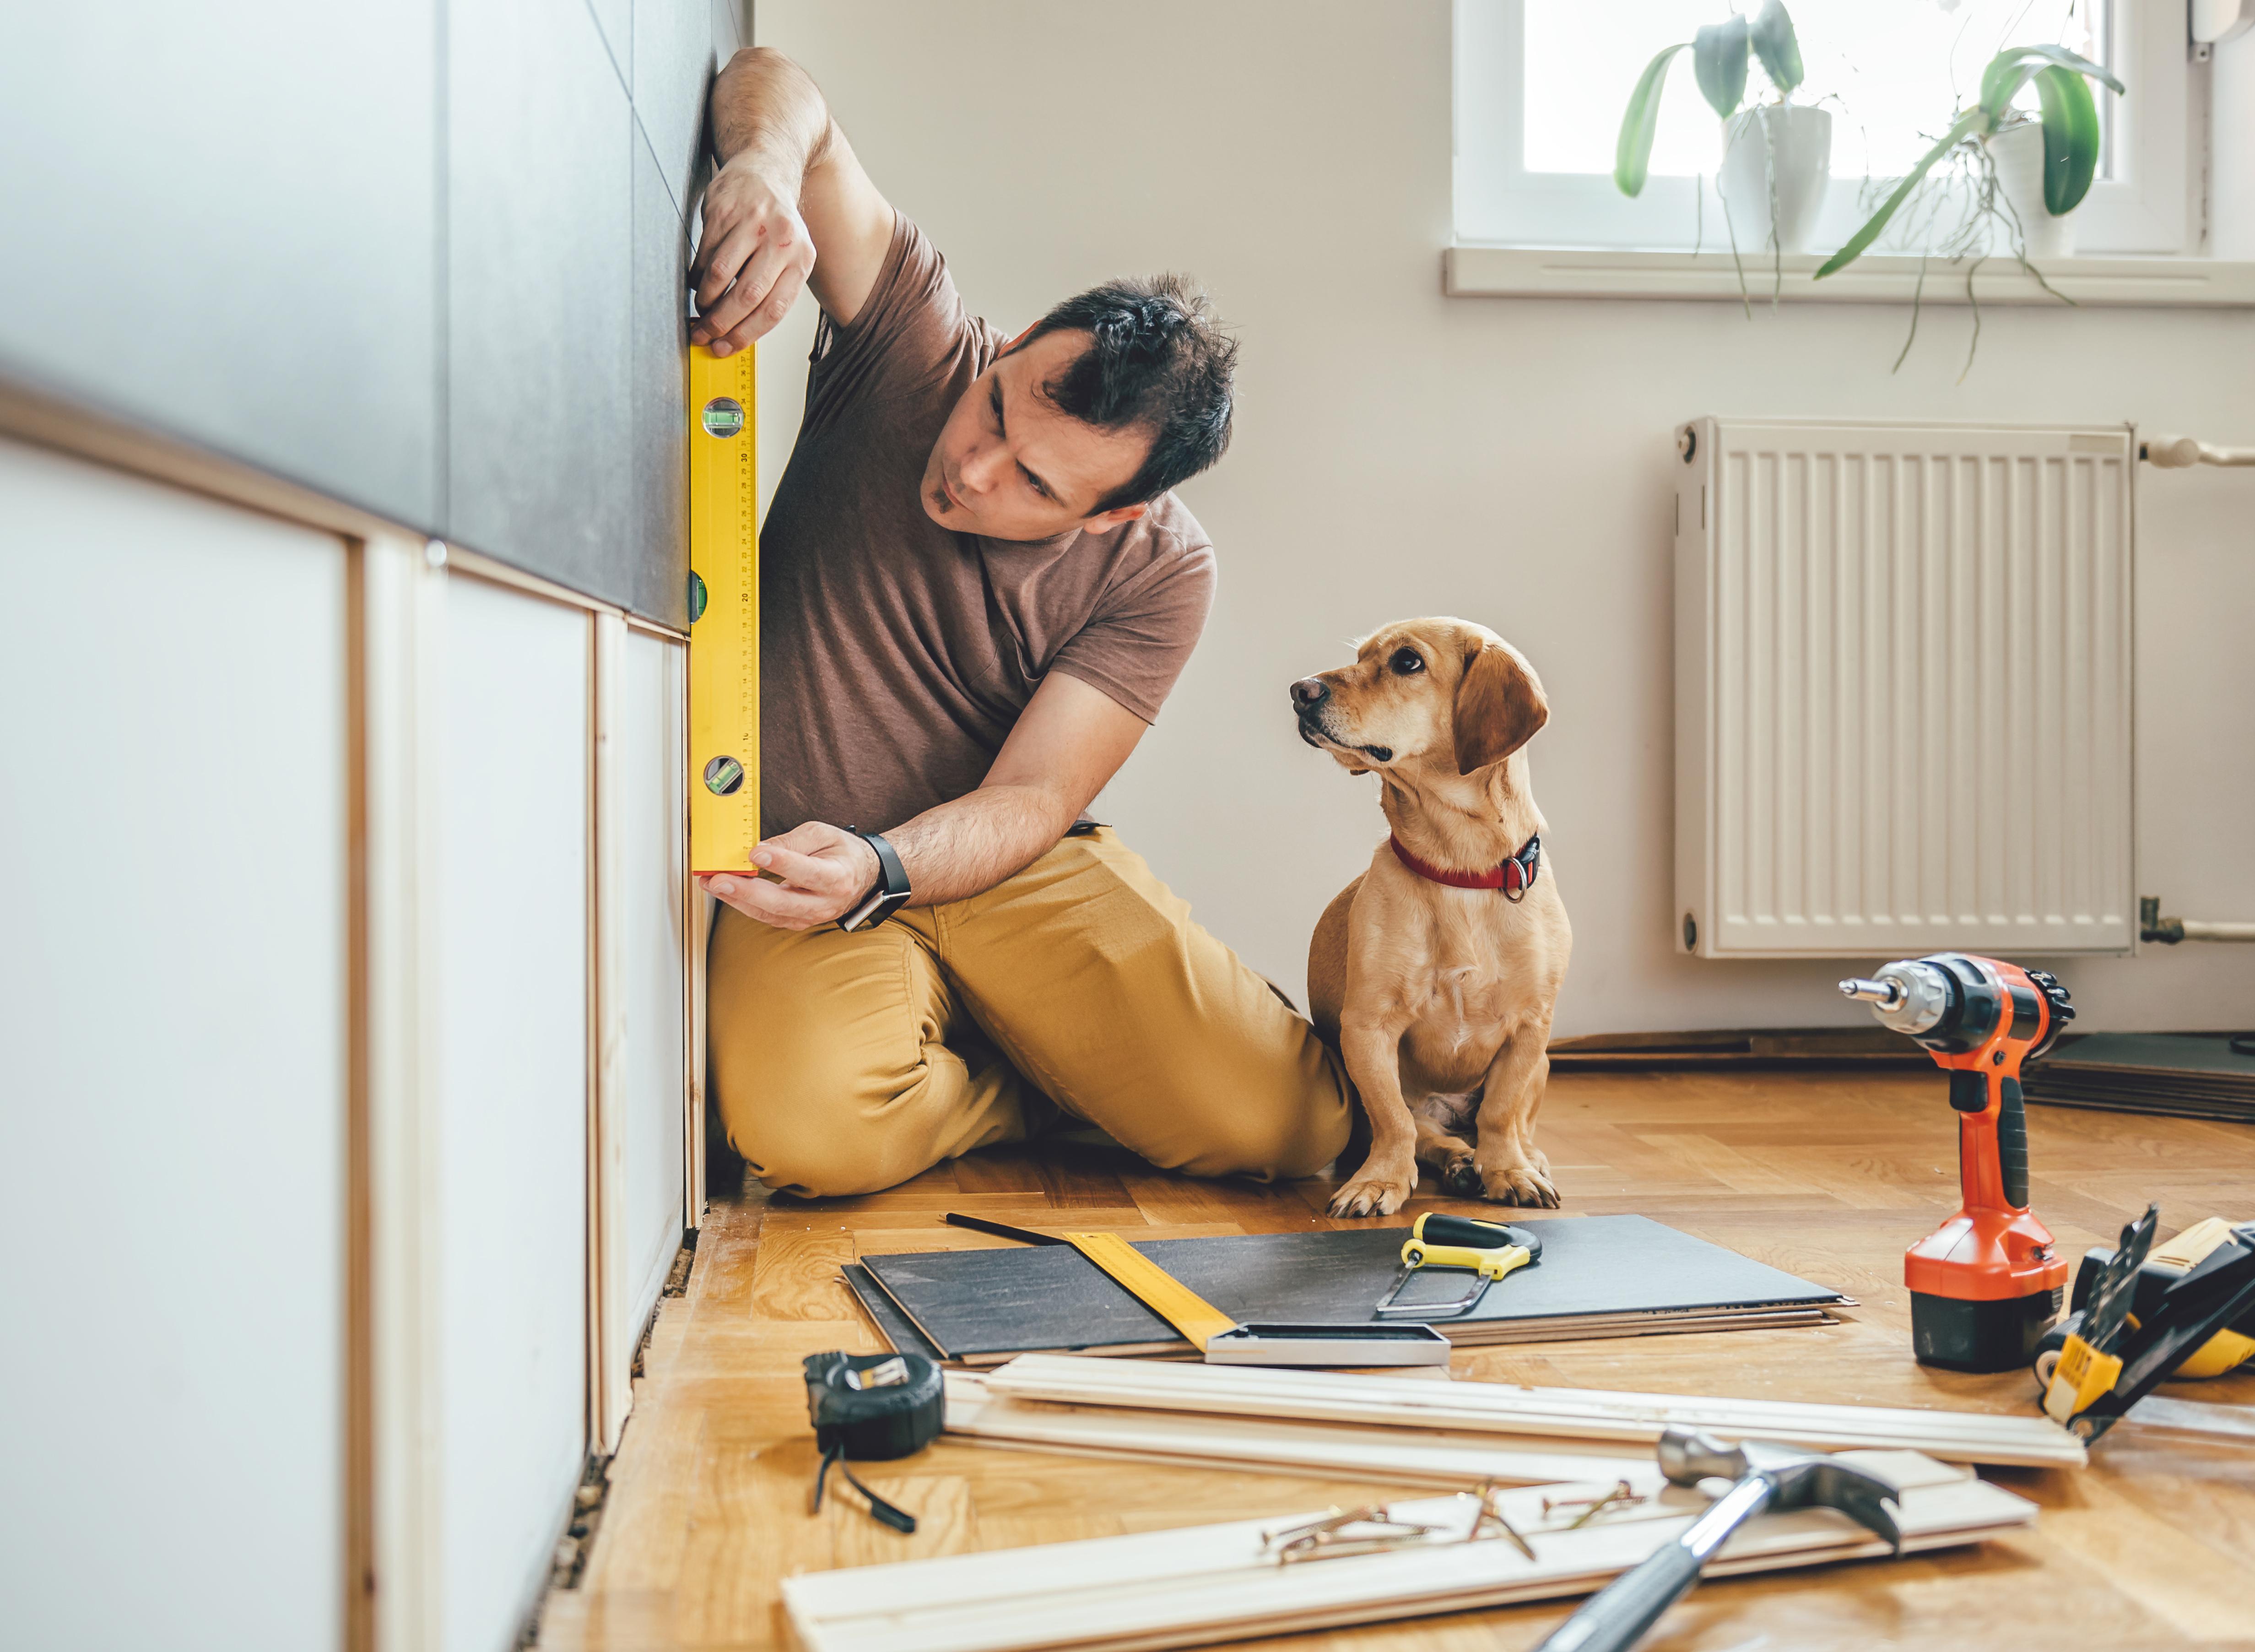 Man renovating house